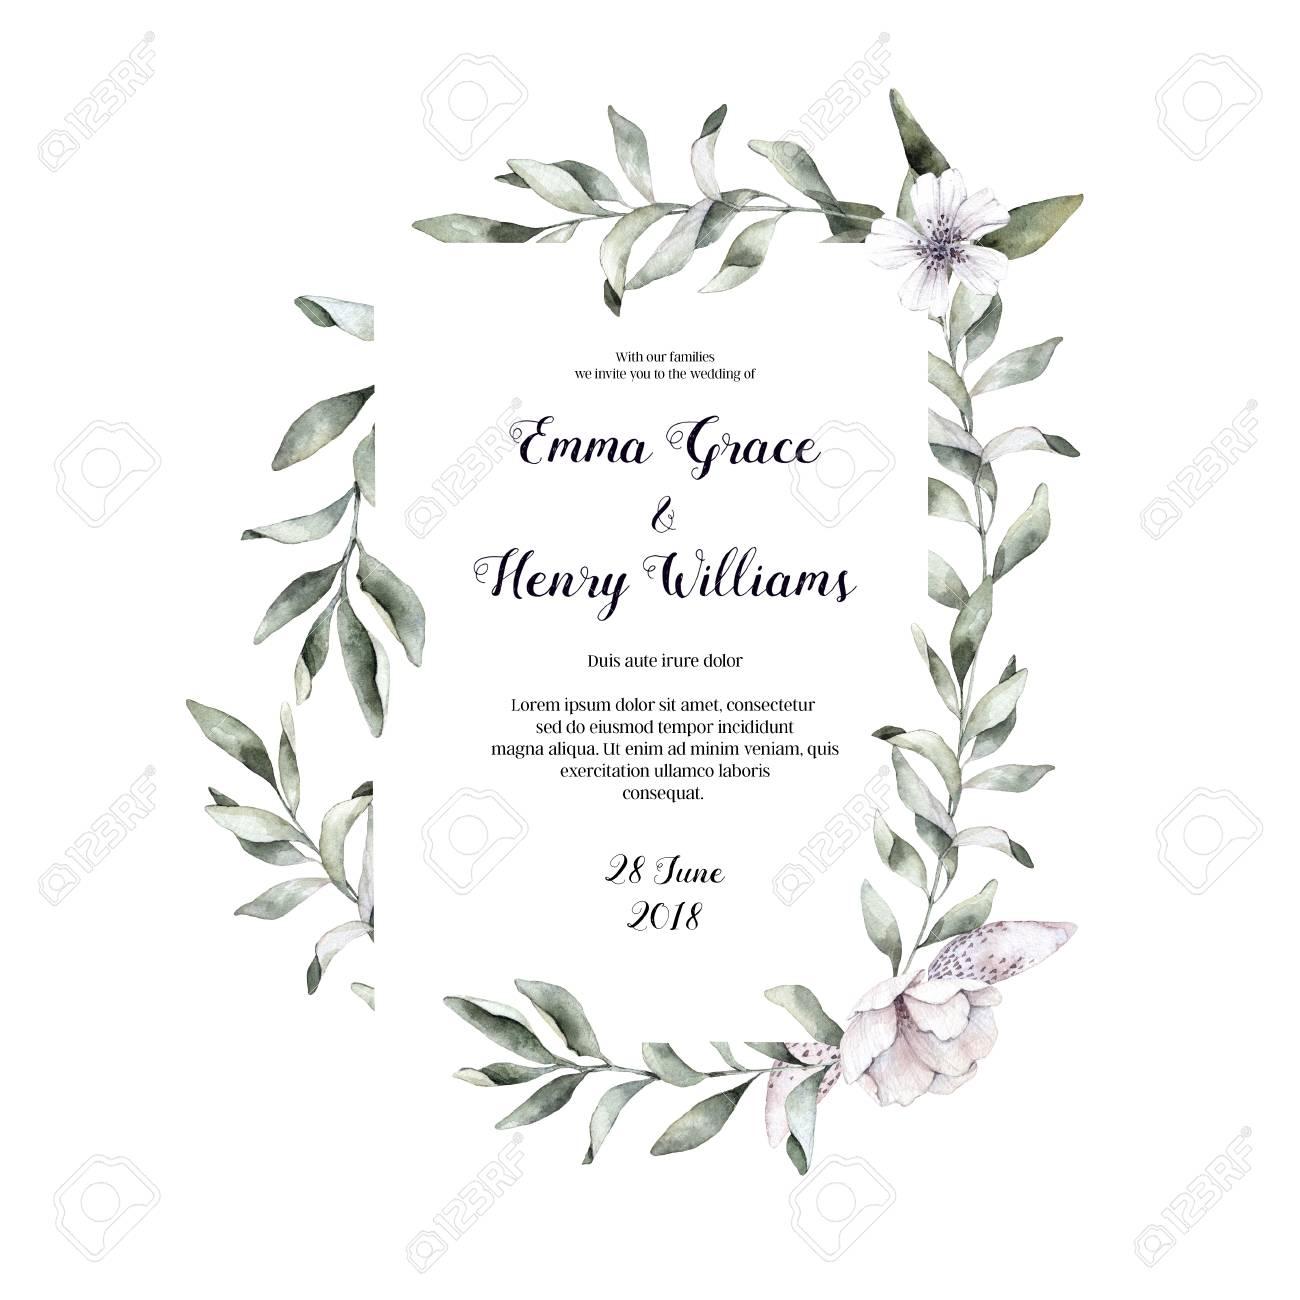 Hand Drawn Watercolor Illustration Botanical Wedding Invitation